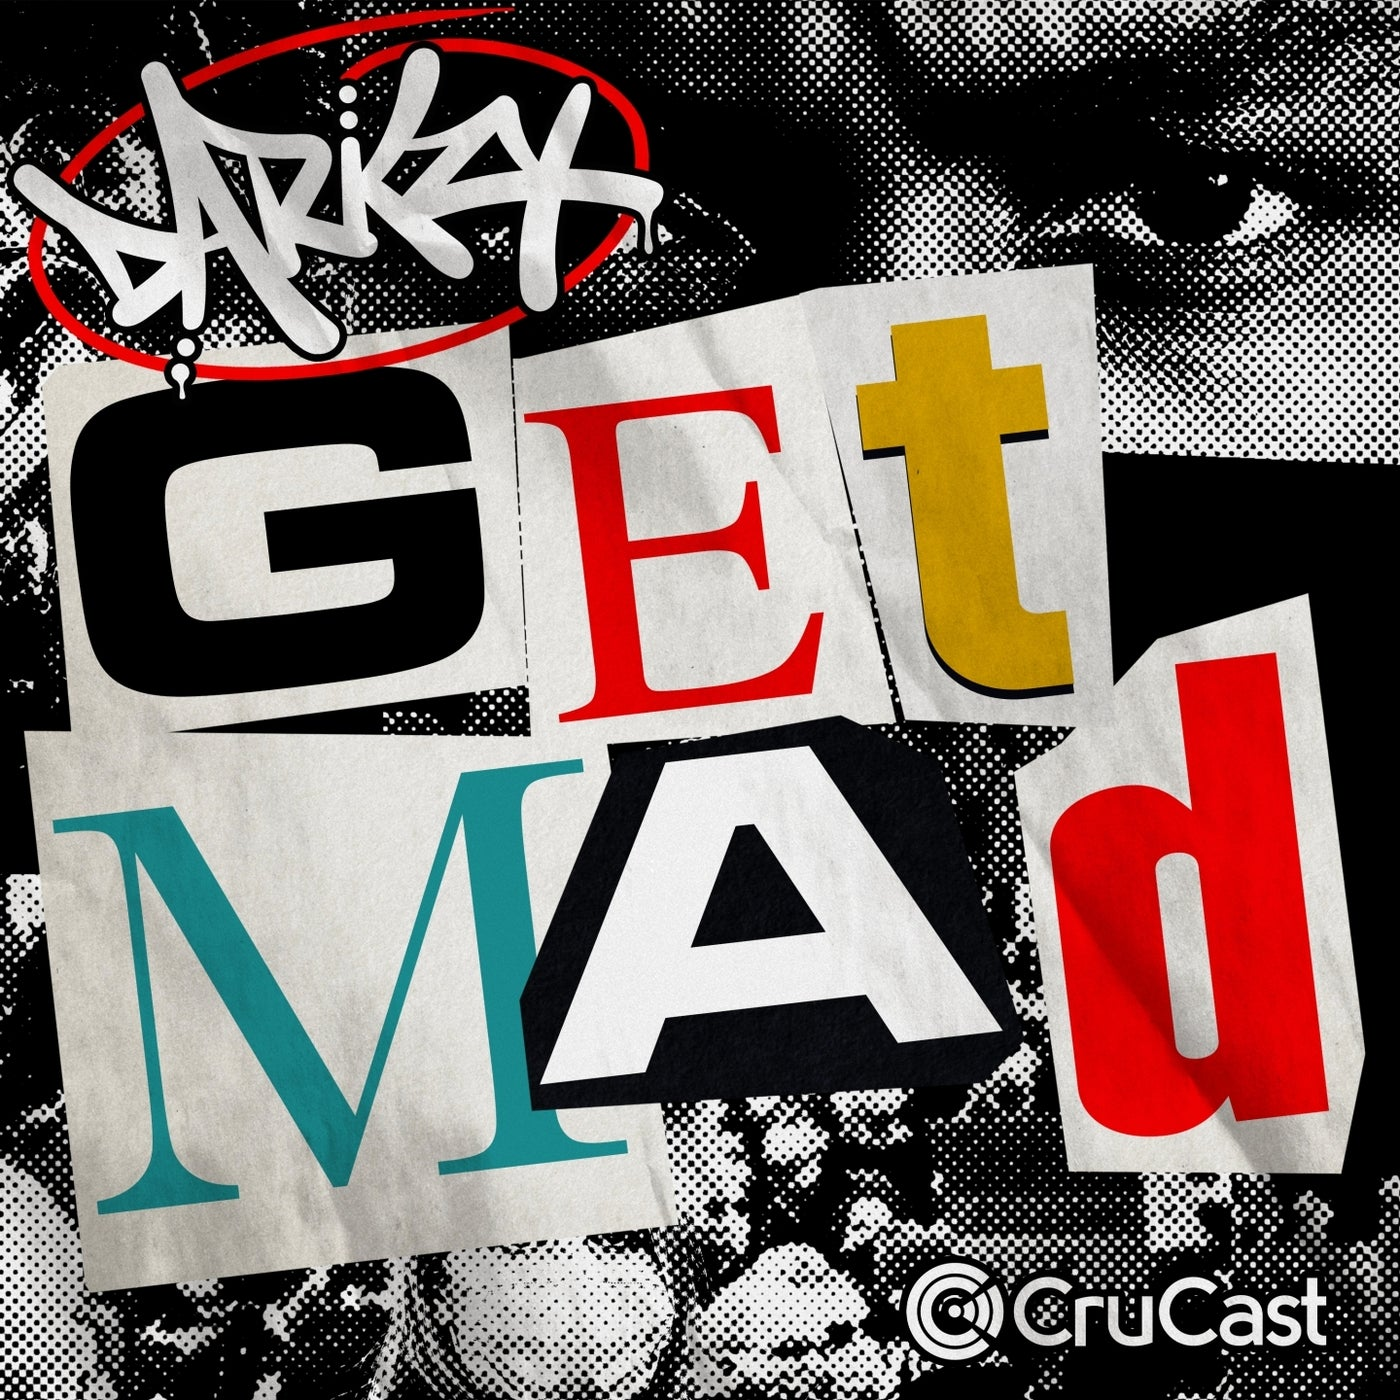 Get Mad (Original Mix)